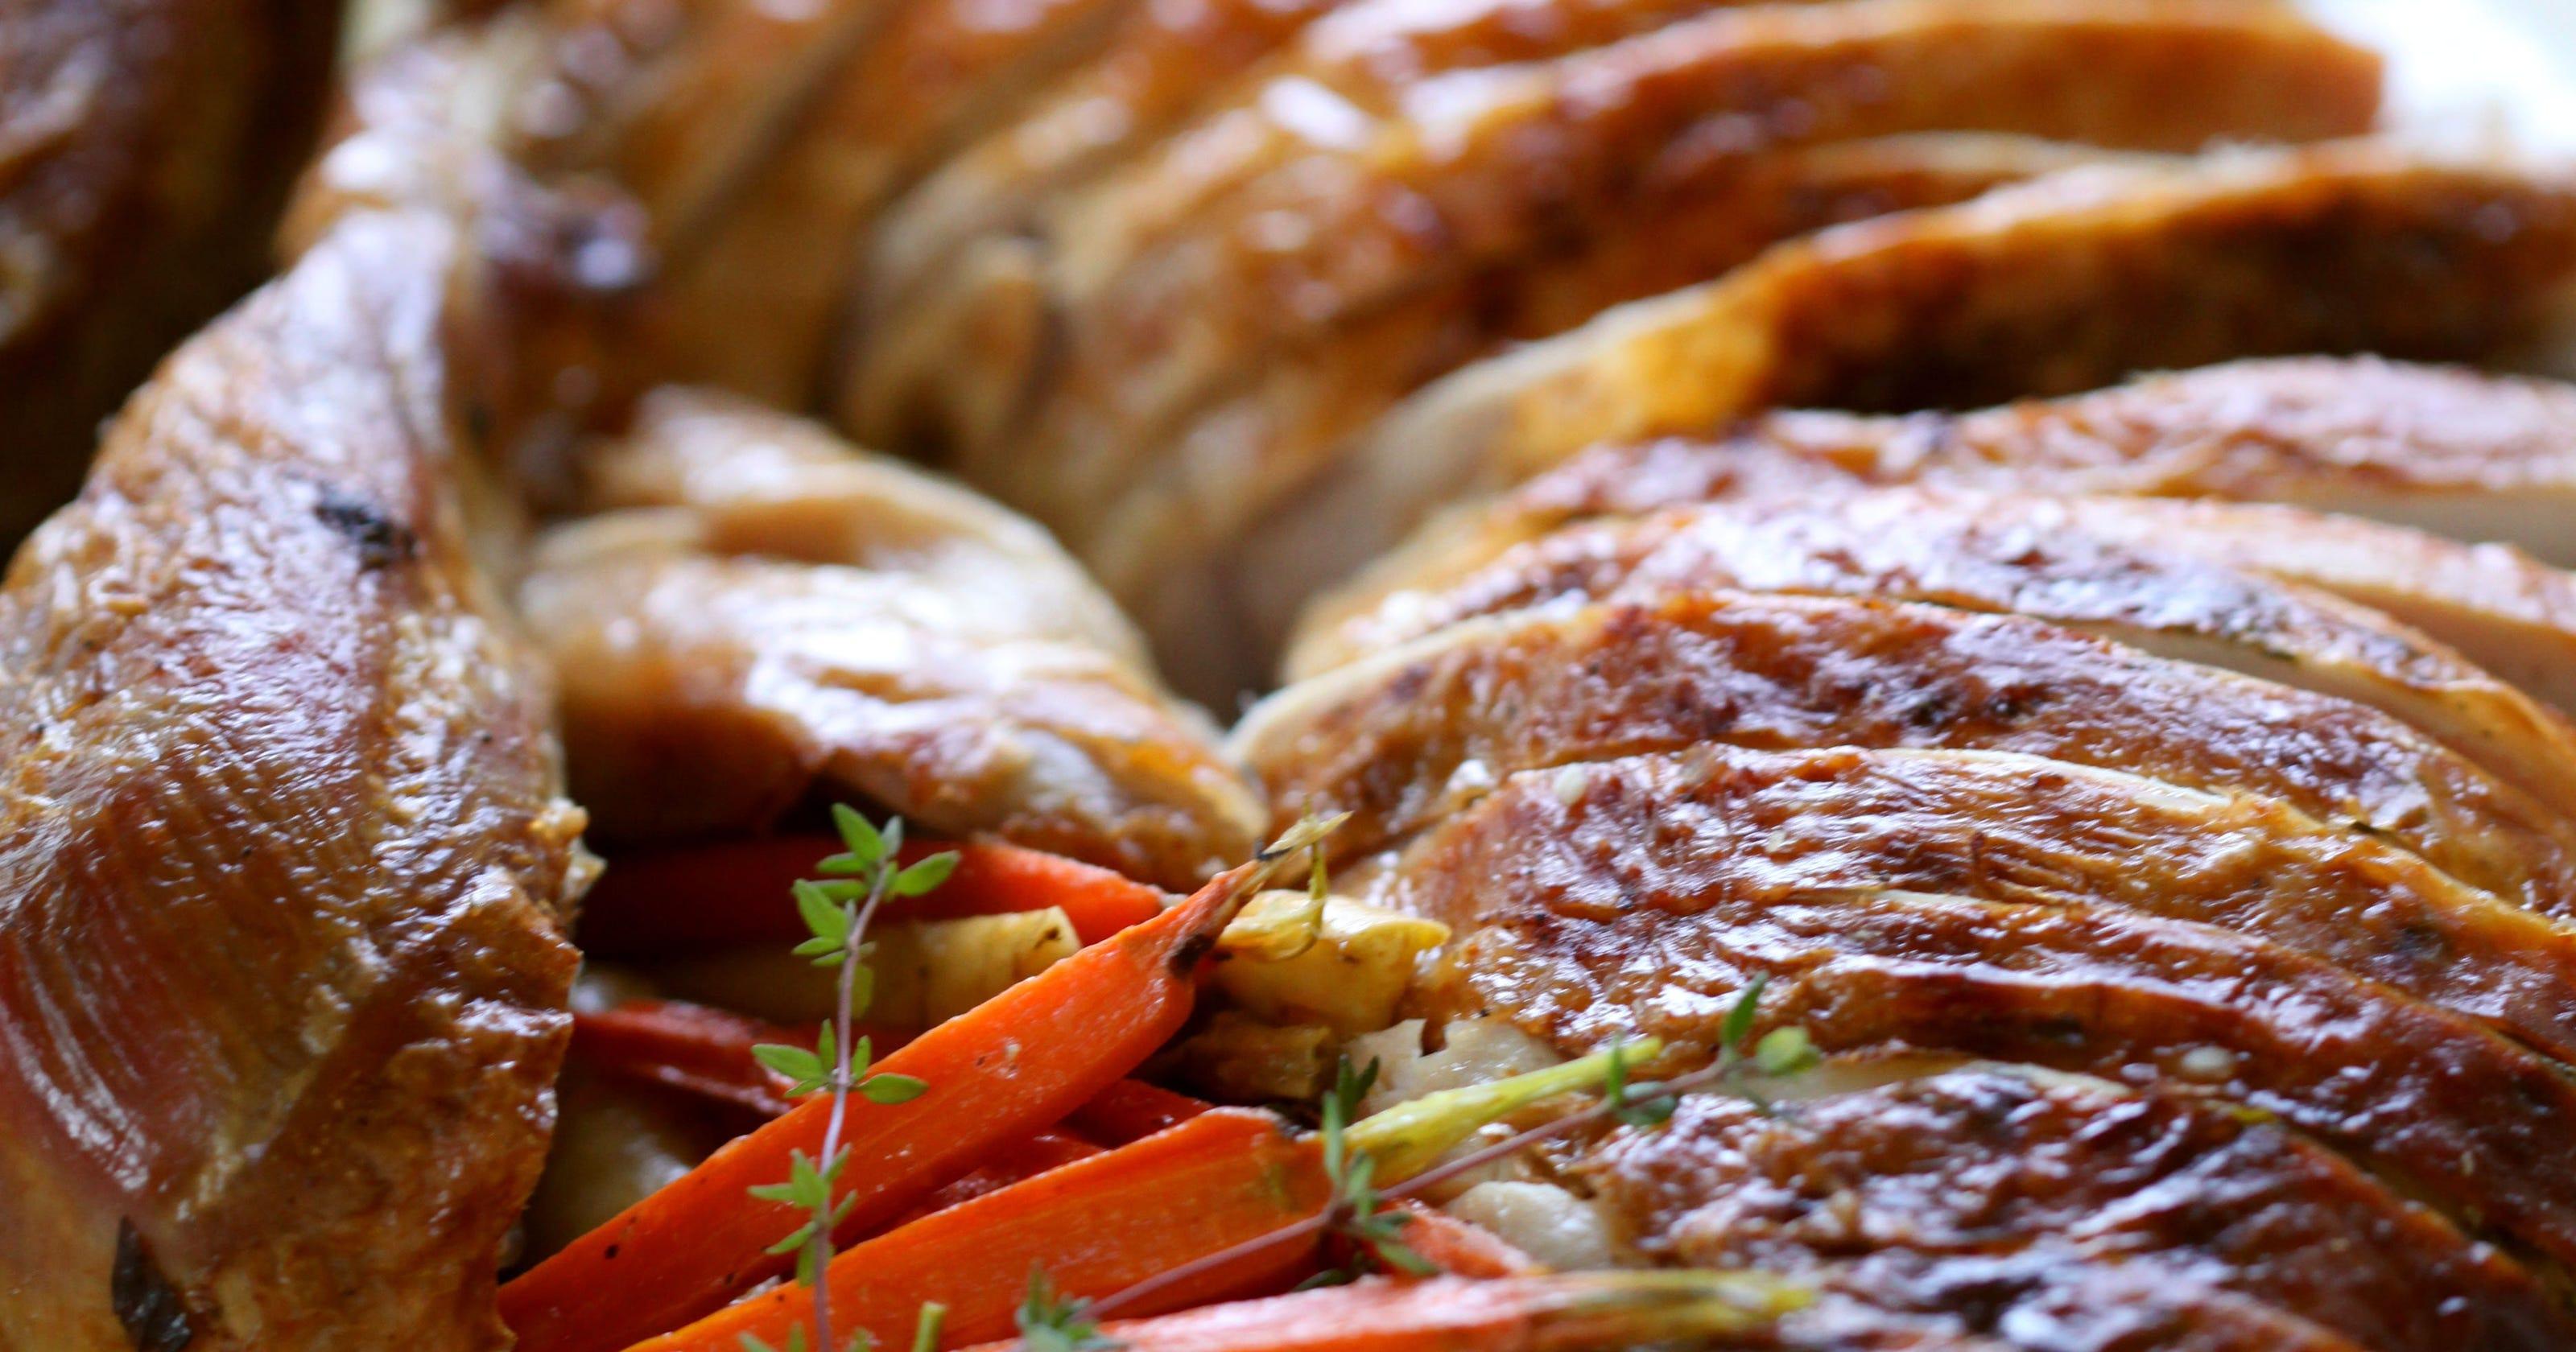 how to keep turkey breast moist